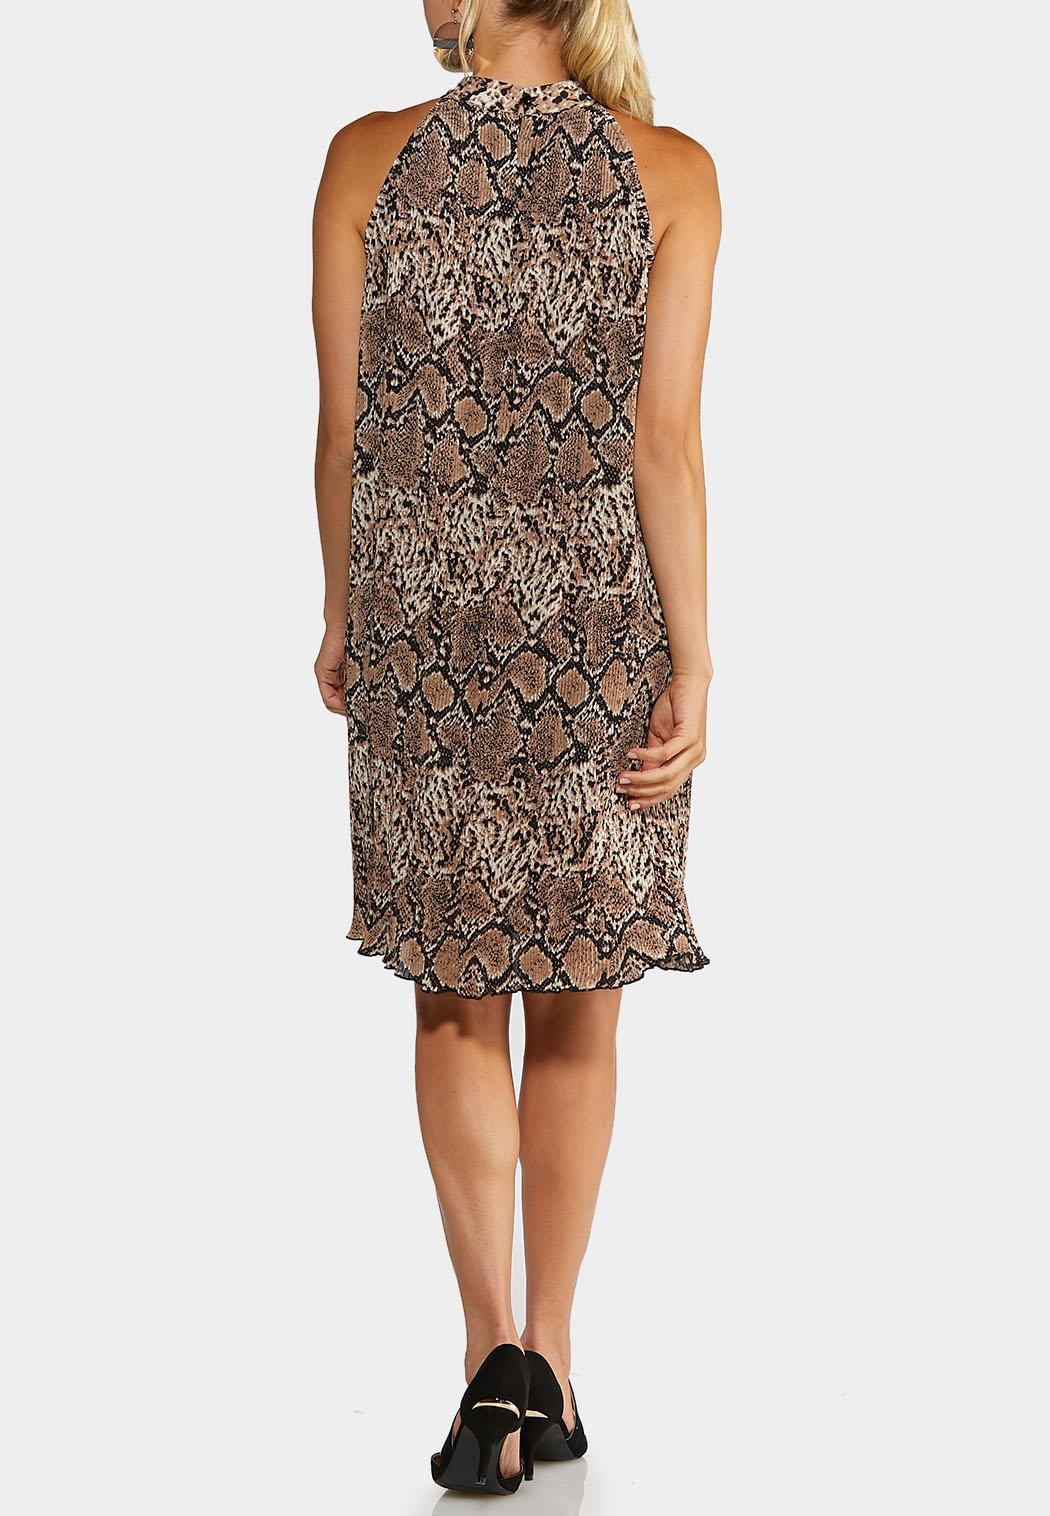 Plus Size Pleated Snakeskin Dress (Item #43993012)